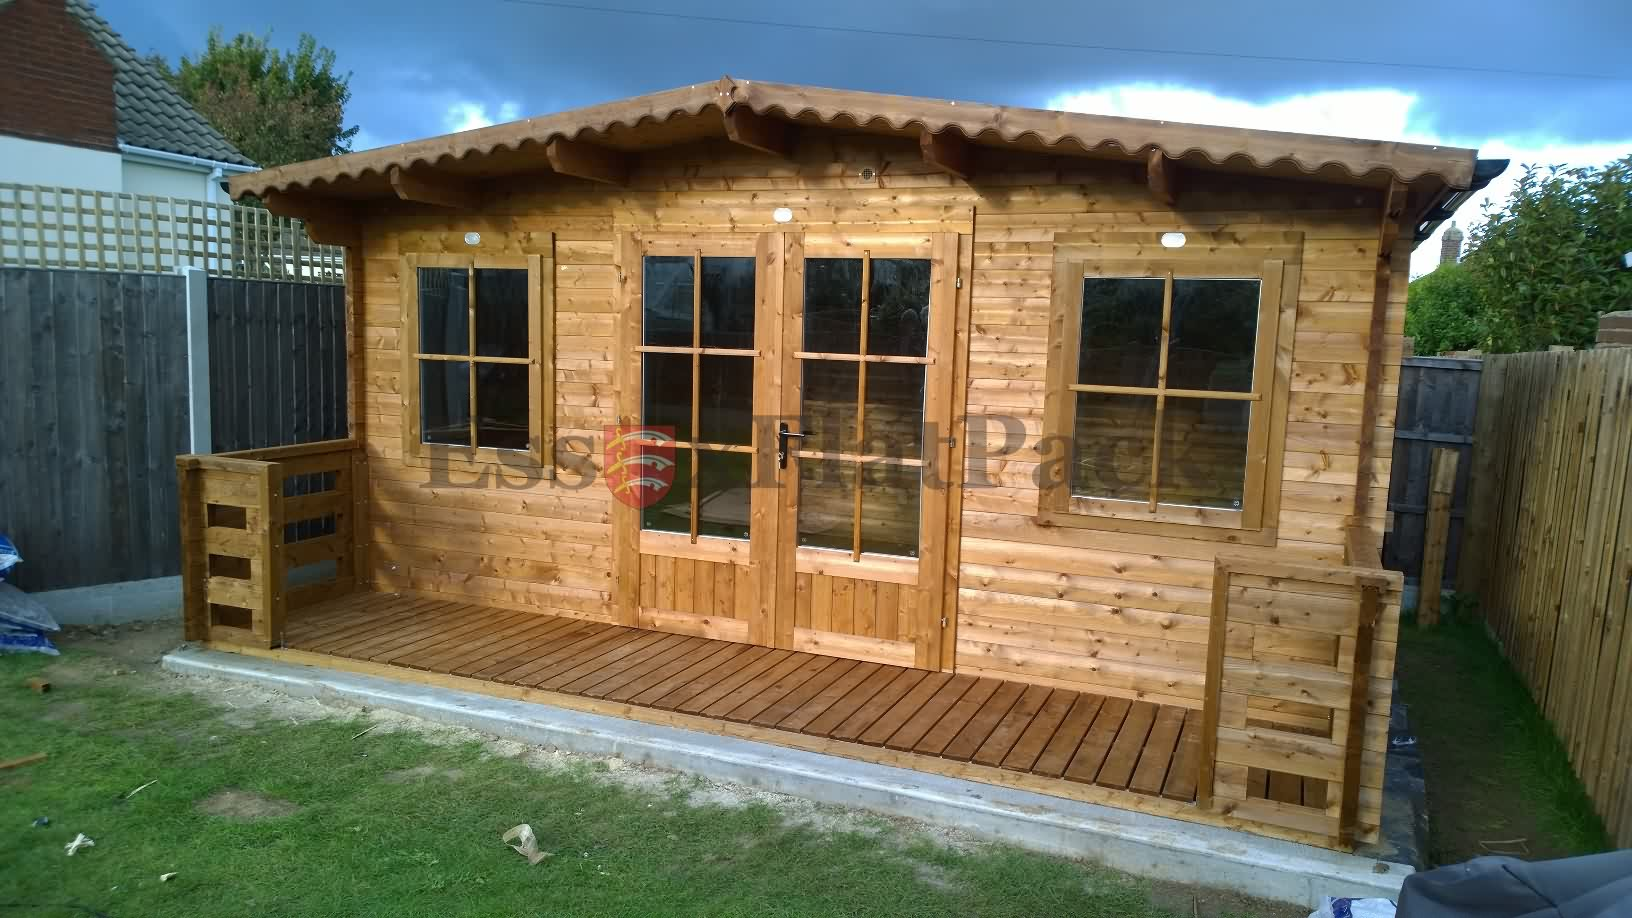 essexflatpack-log-cabins-20170916174559.jpg